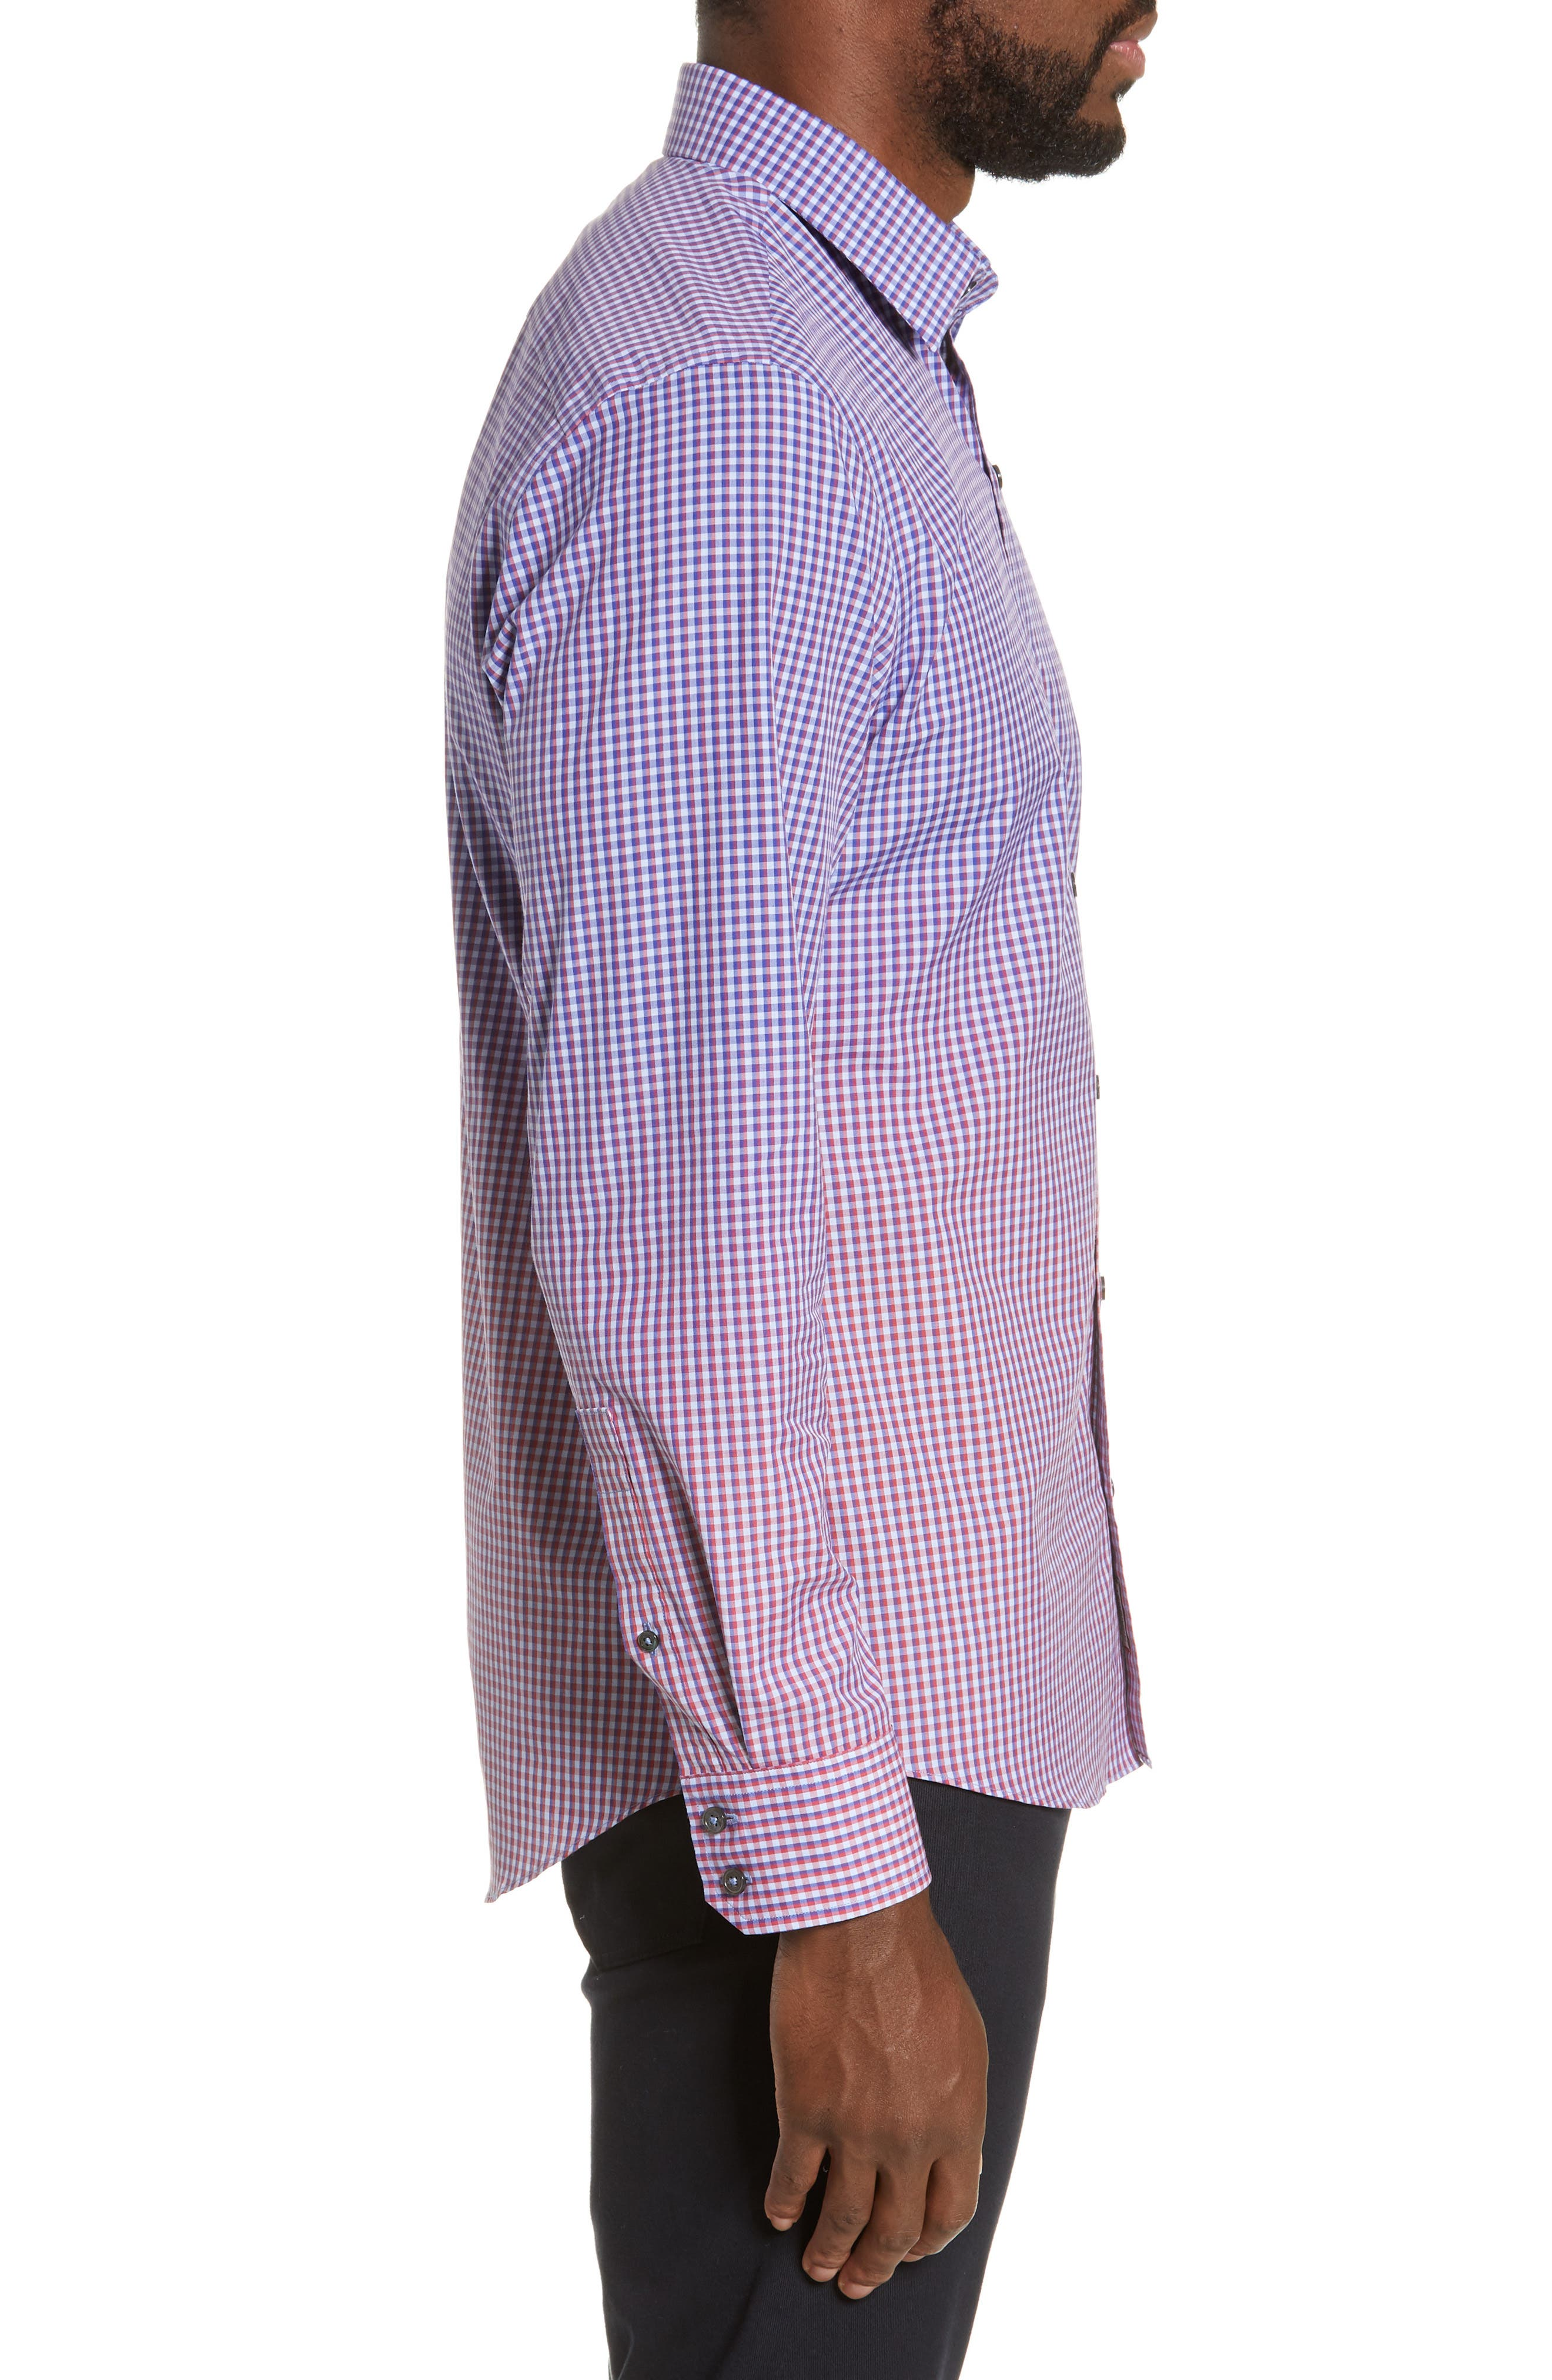 ZACHARY PRELL, Germain Regular Fit Gradient Check Sport Shirt, Alternate thumbnail 4, color, RED